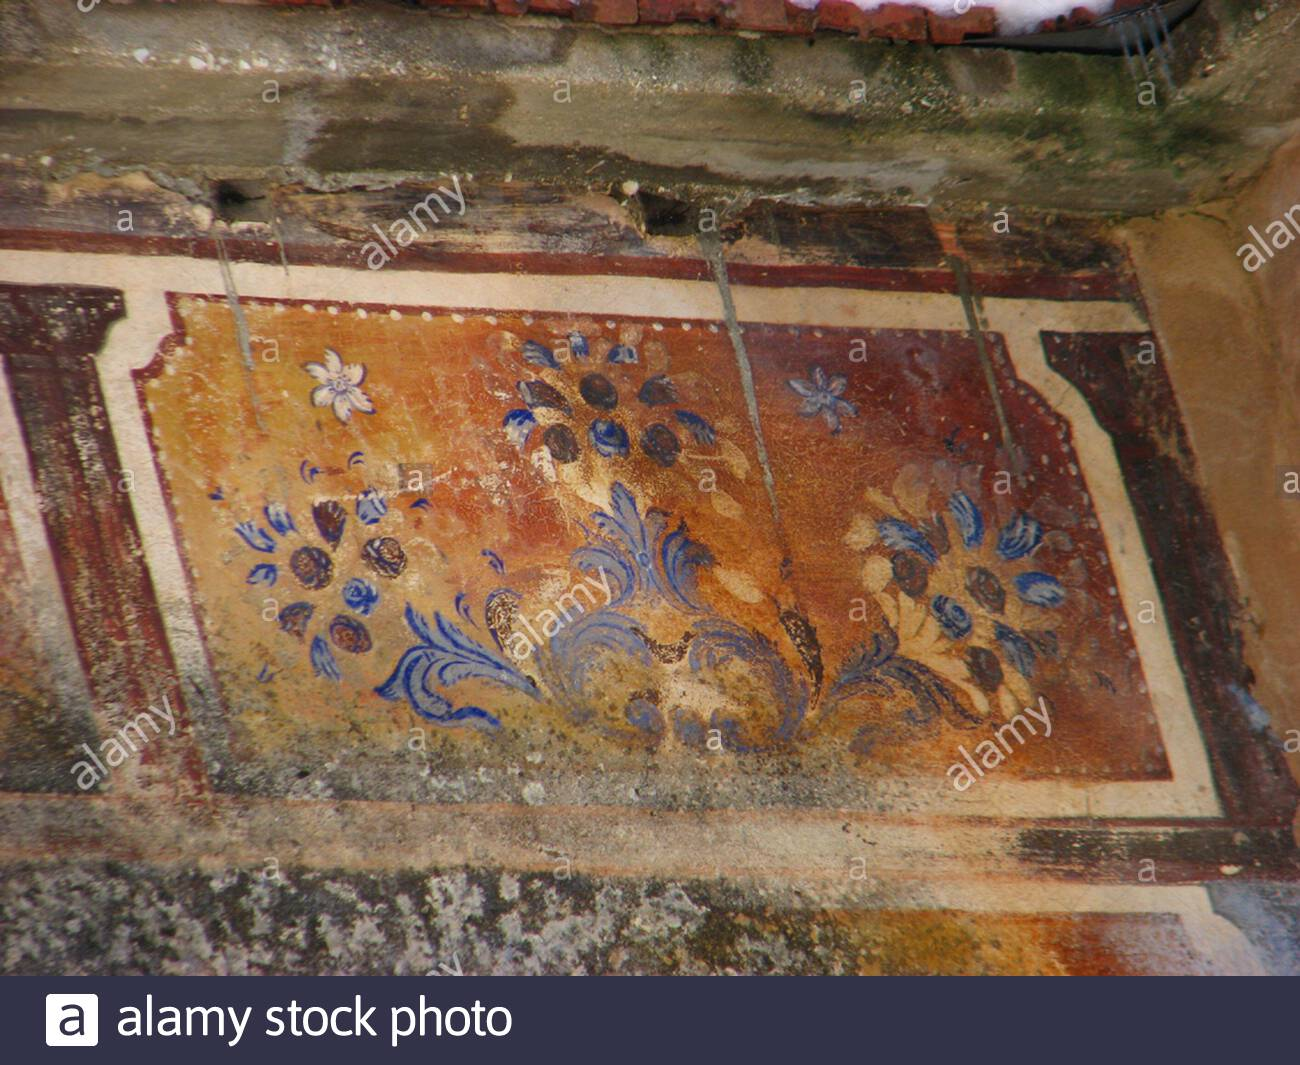 floor decor flooring checkered.htm the  part i  stock photos   the  part i  stock images page 47  the  part i  stock photos   the  part i